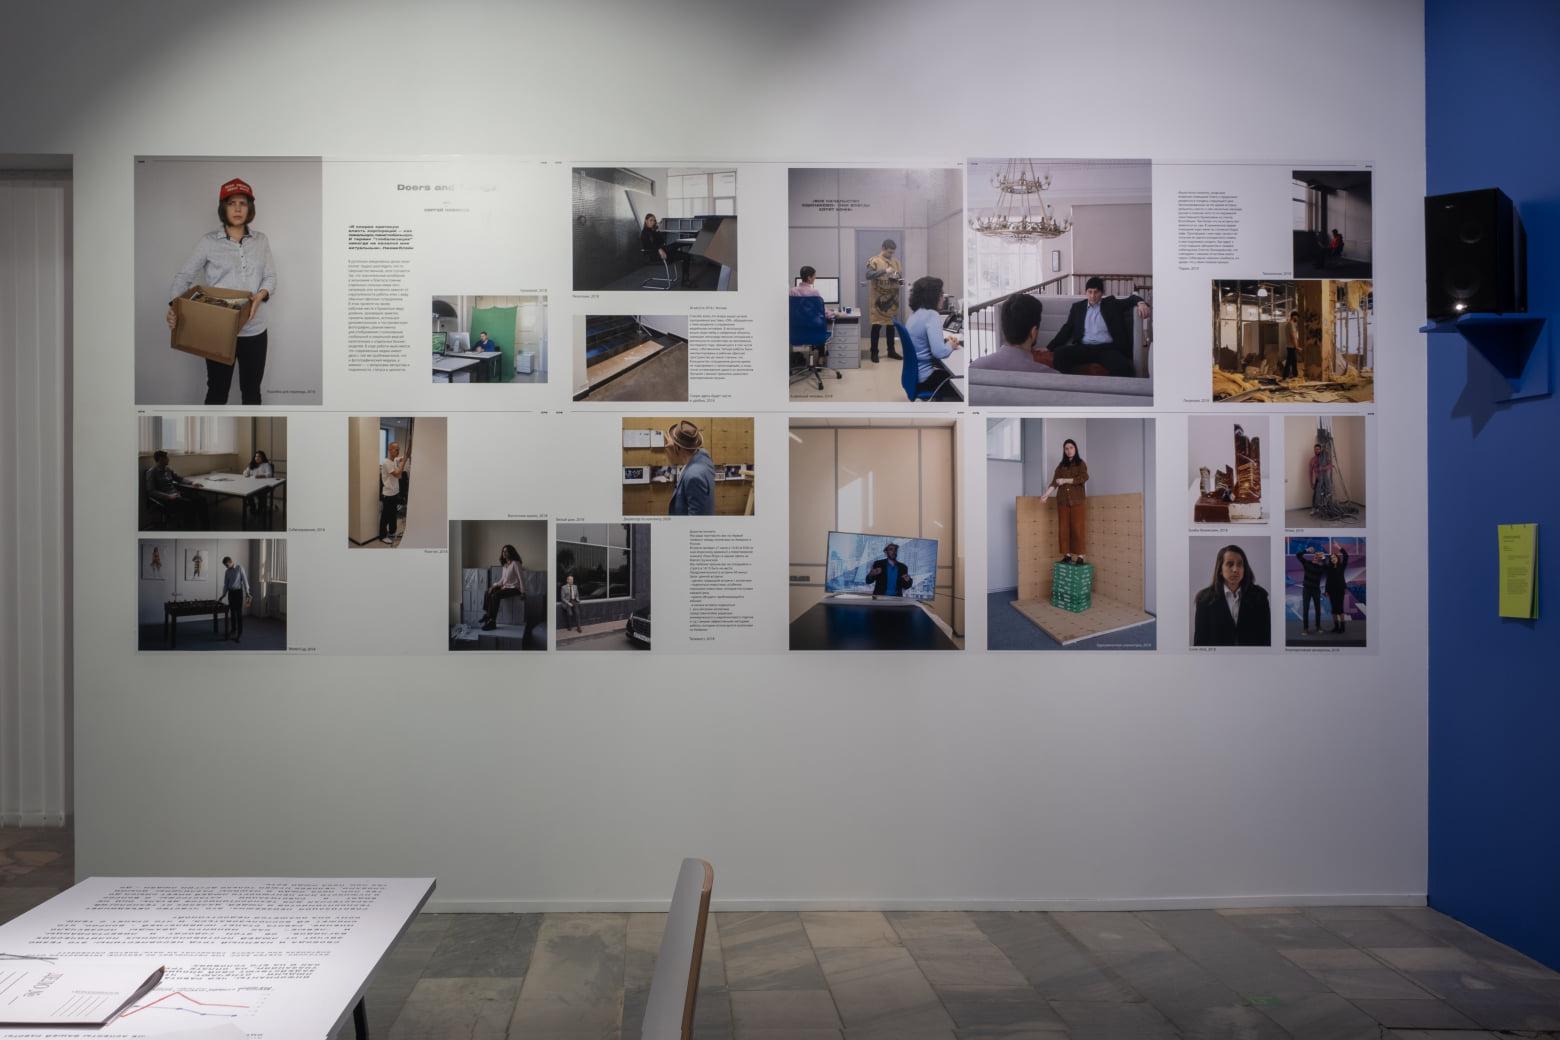 Проект Doers and Doings Сергея Новикова. Фрагмент экспозиции. Фотографии Research Arts (2020)